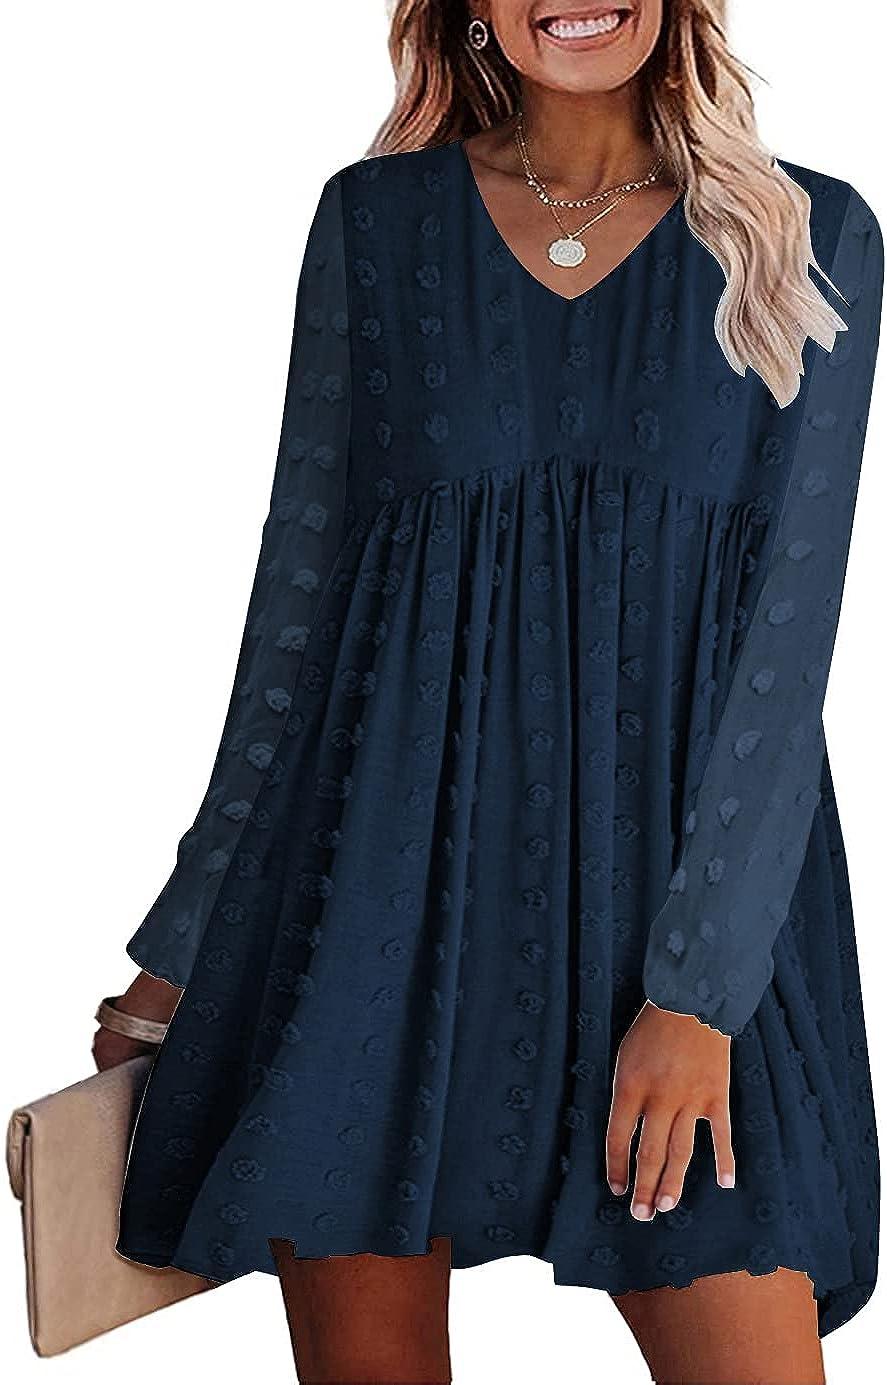 KIRUNDO Women's Dresses Long Sleeves Short Mini Dress V Neck Flowy Casual Swiss Dot Loose Fit Babydoll Dress